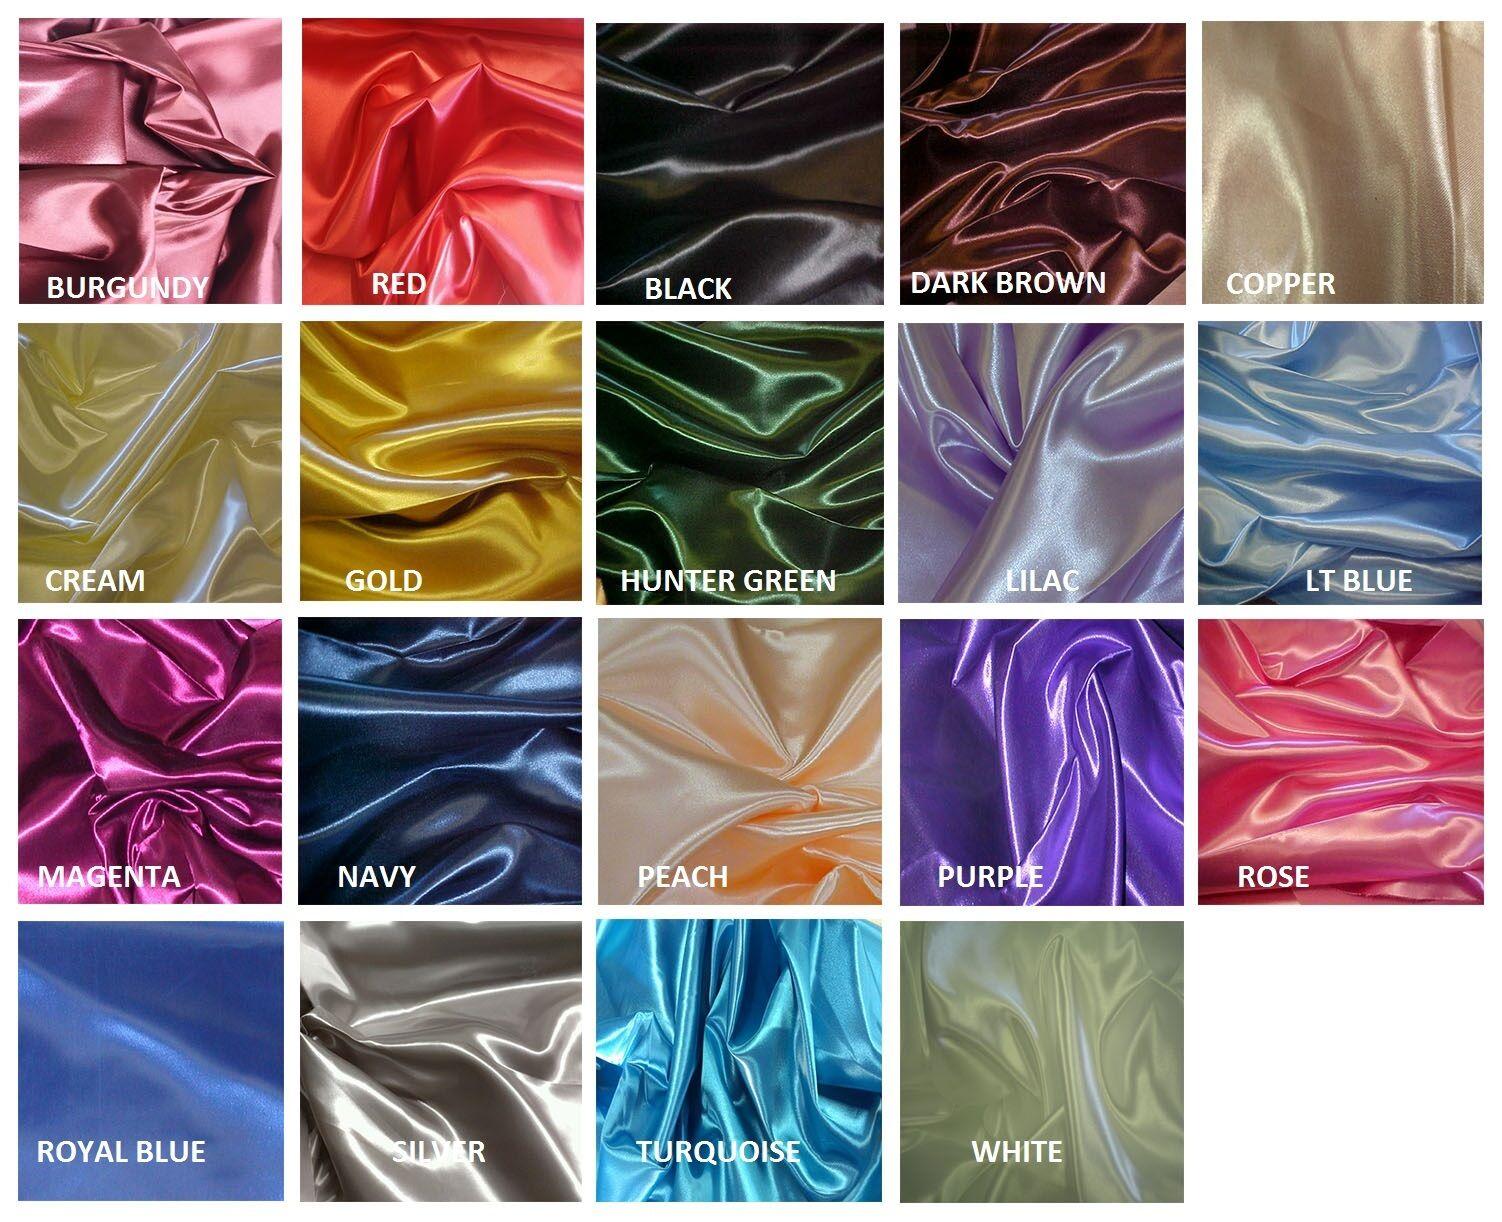 ❤️ Bridal Shiny Satin Curtain Drape Panel Backdrop apx 6